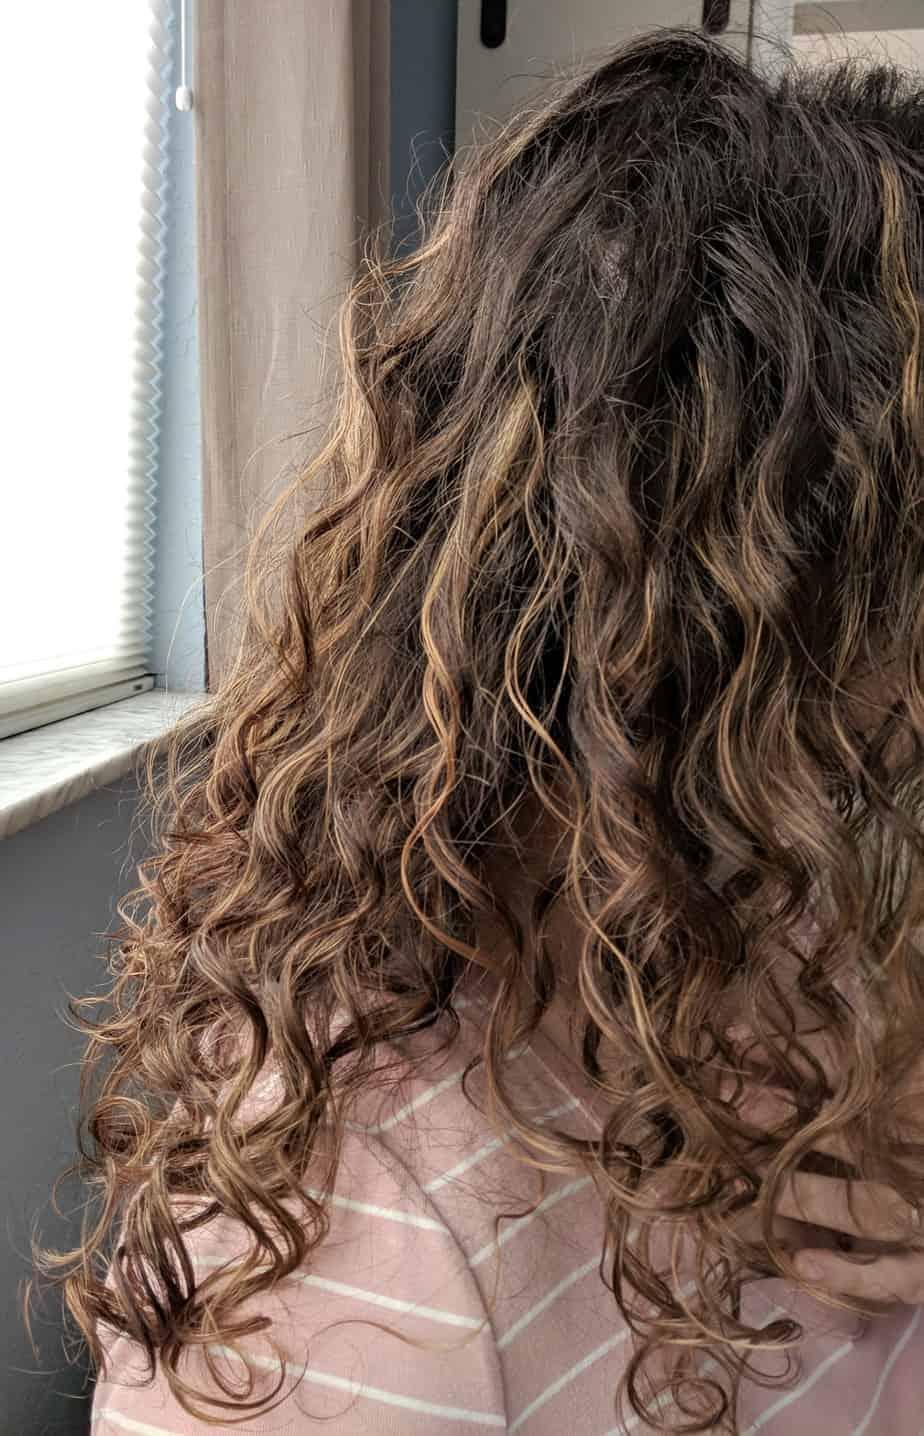 Curly Hair Routine for 2B 2C 3A Hair